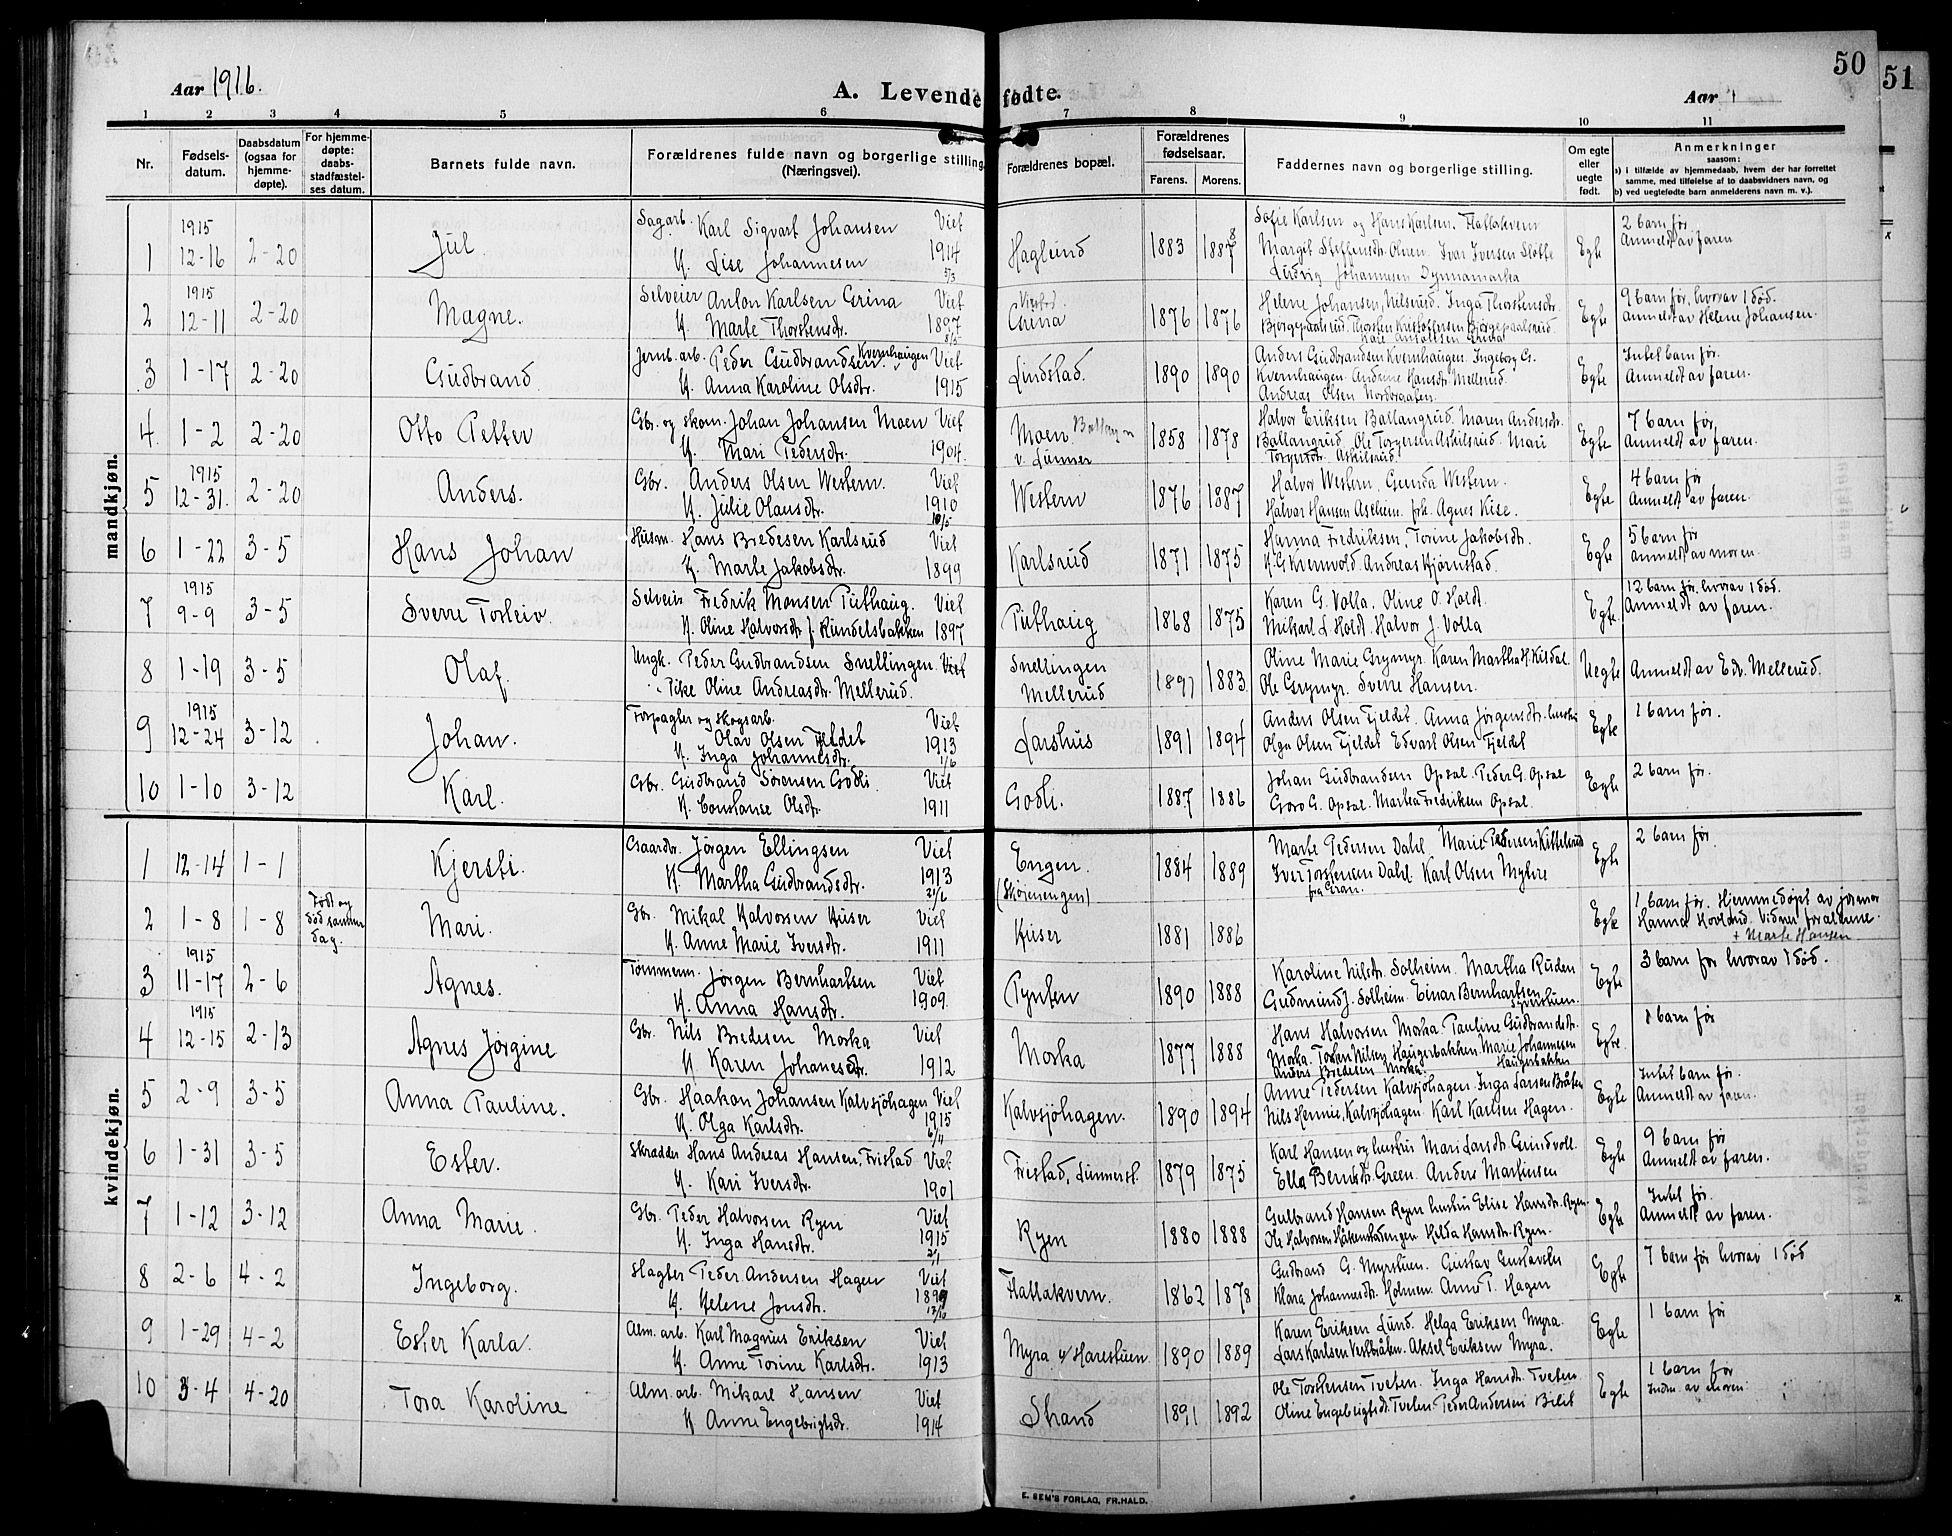 SAH, Lunner prestekontor, H/Ha/Hab/L0001: Klokkerbok nr. 1, 1909-1922, s. 50